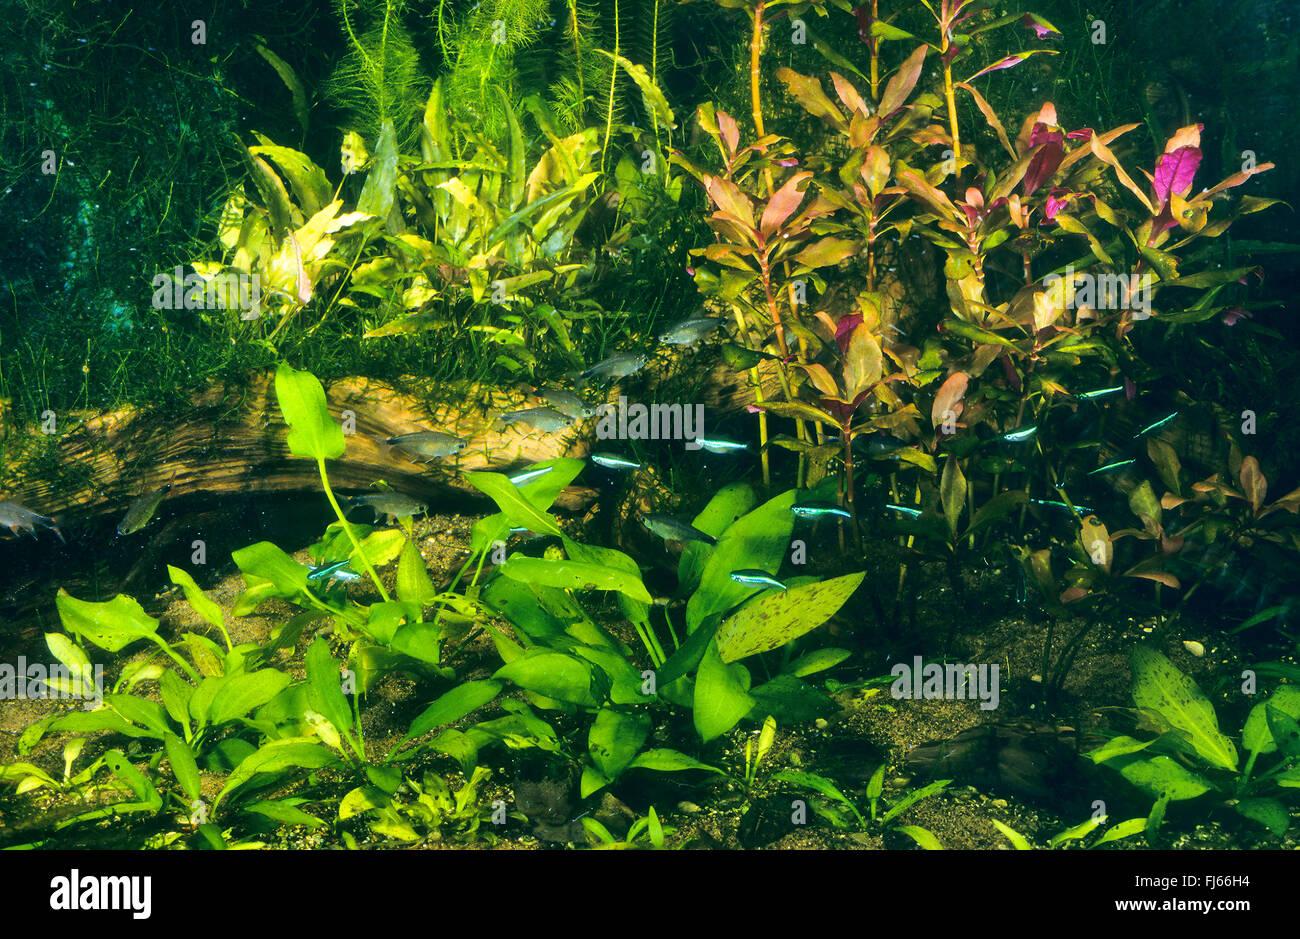 Freshwater aquarium fish neon - Green Neon Tetra Paracheirodon Simulans Hyphessobrycon Simulans Tropical Fresh Water Fish Tank